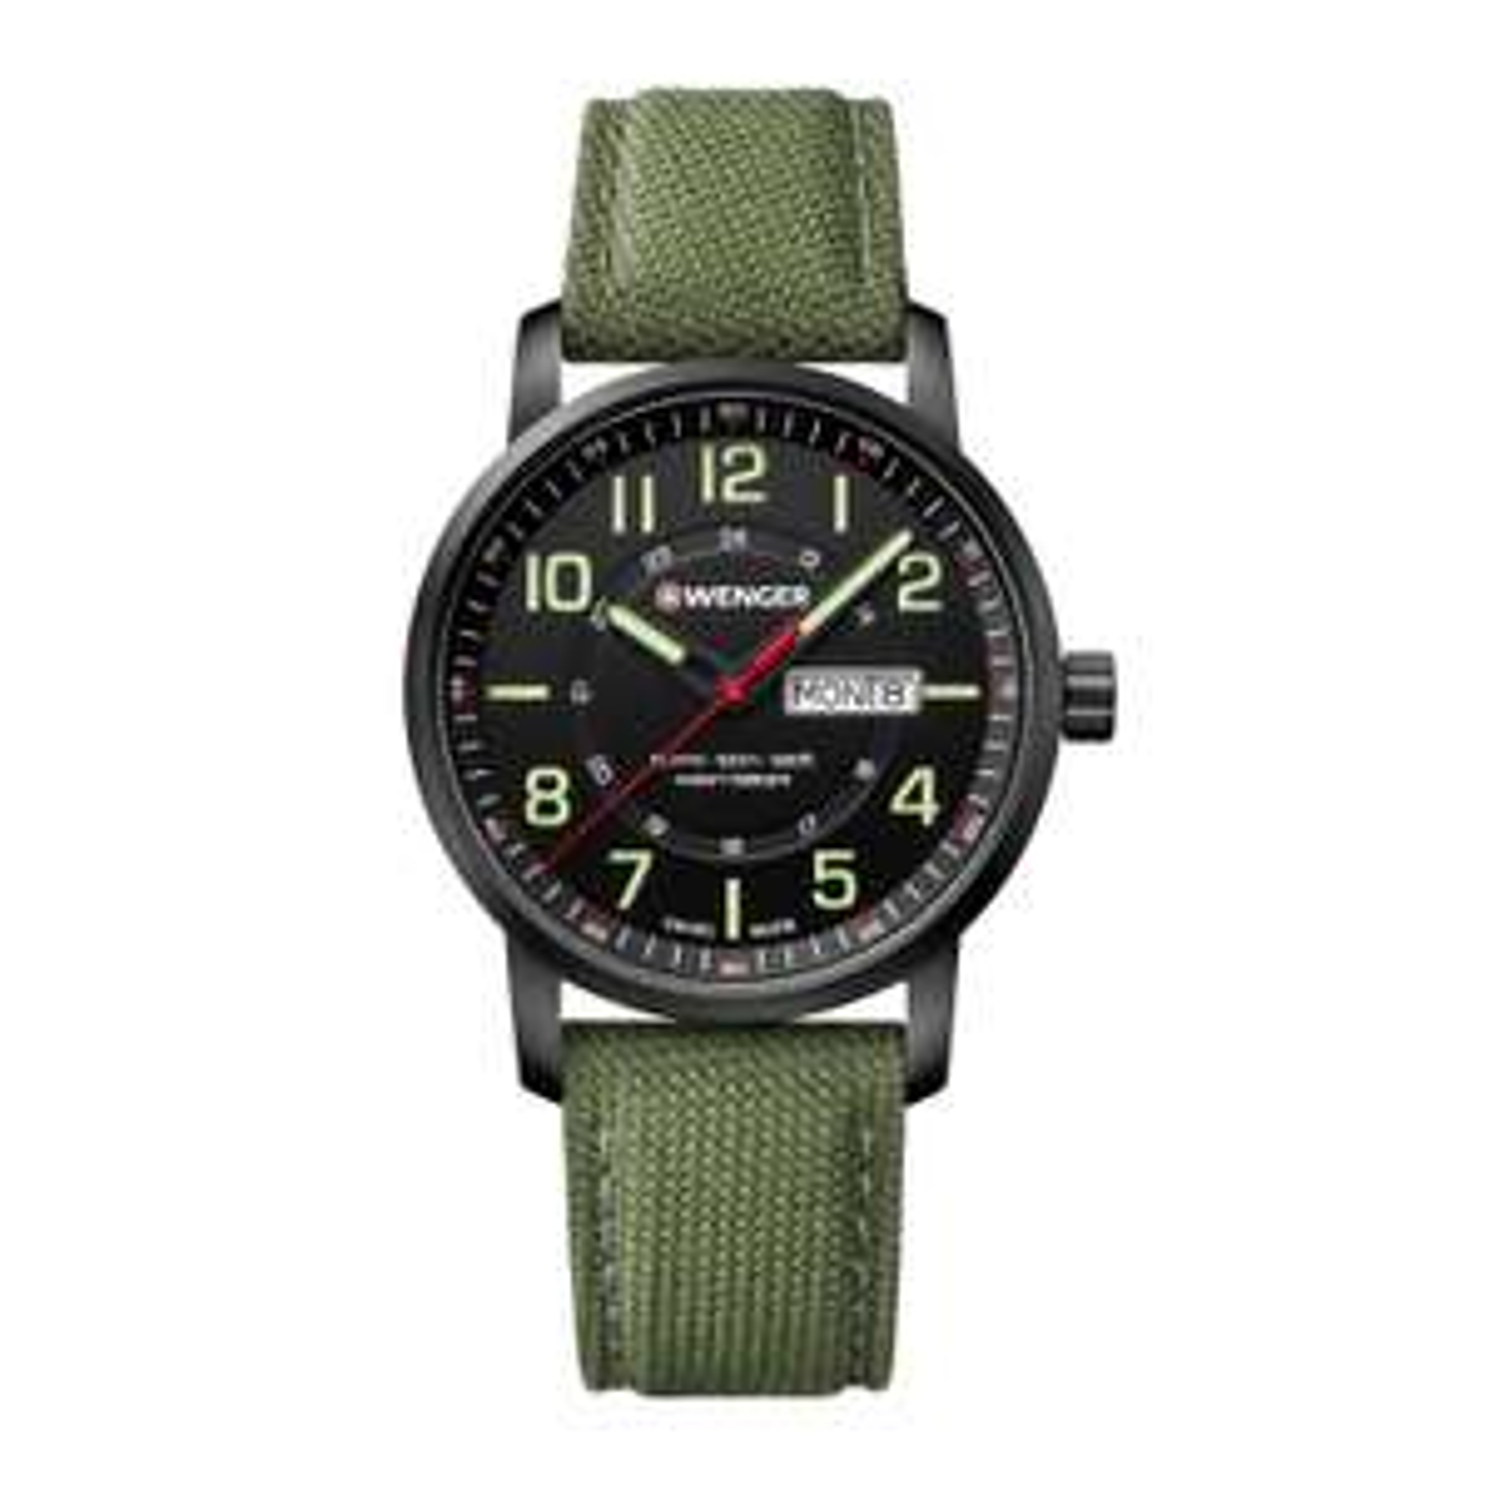 Wenger Attitude Men's Green Fabric Strap Swiss Watch £77 @ H Samuel